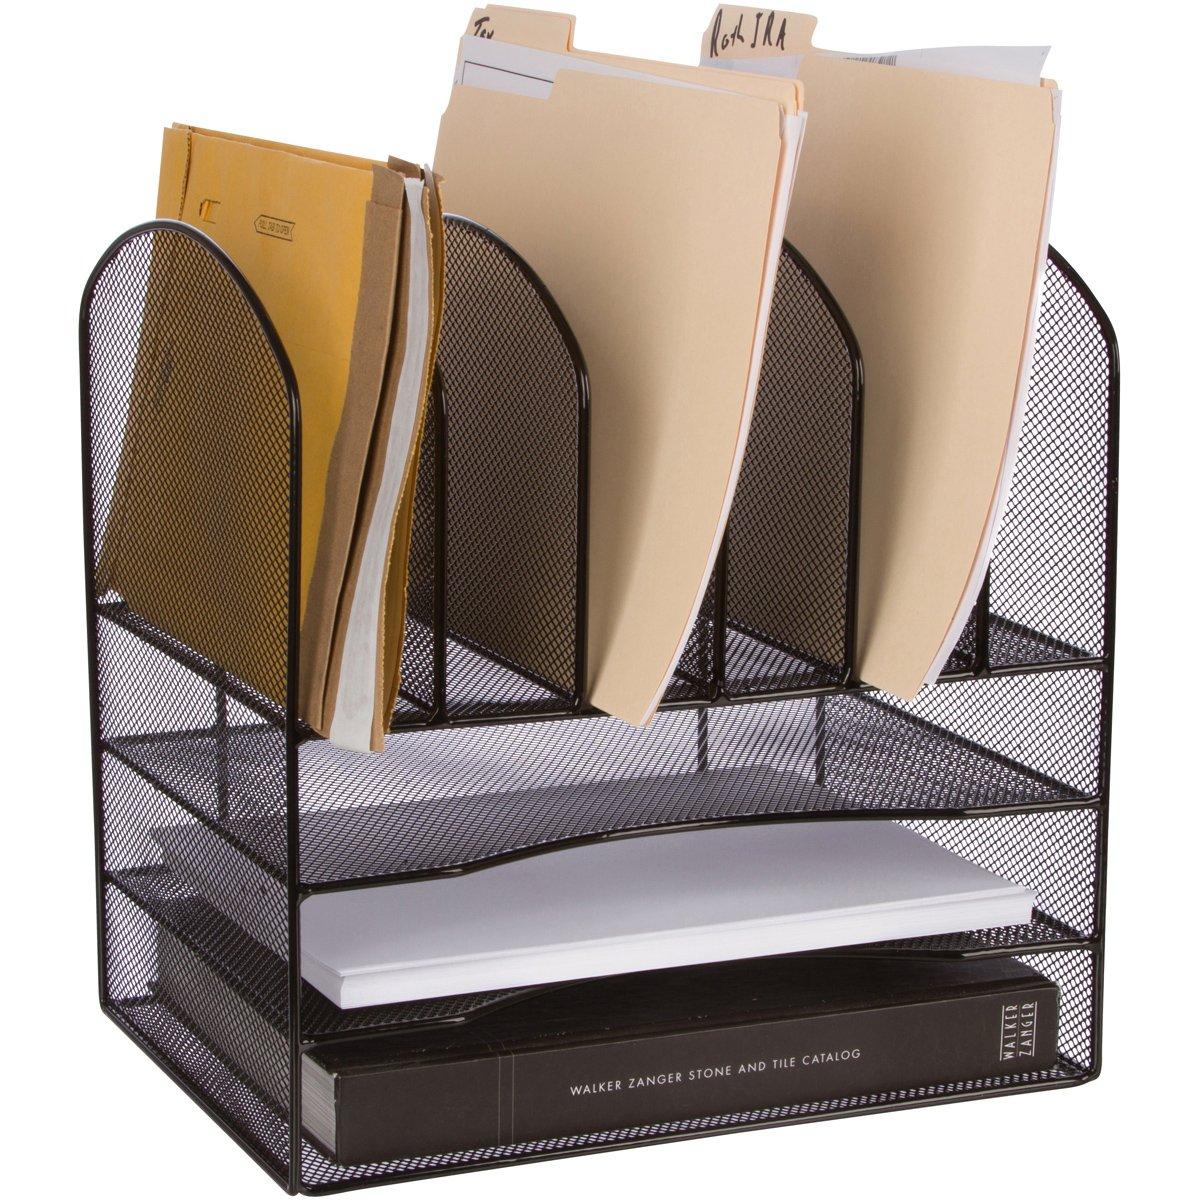 STYLISH Desk File Organizer - ''Zero'' Assembly - 33% more space - Perfect for desktop paper, inbox tray, sorter - Black Wire Mesh